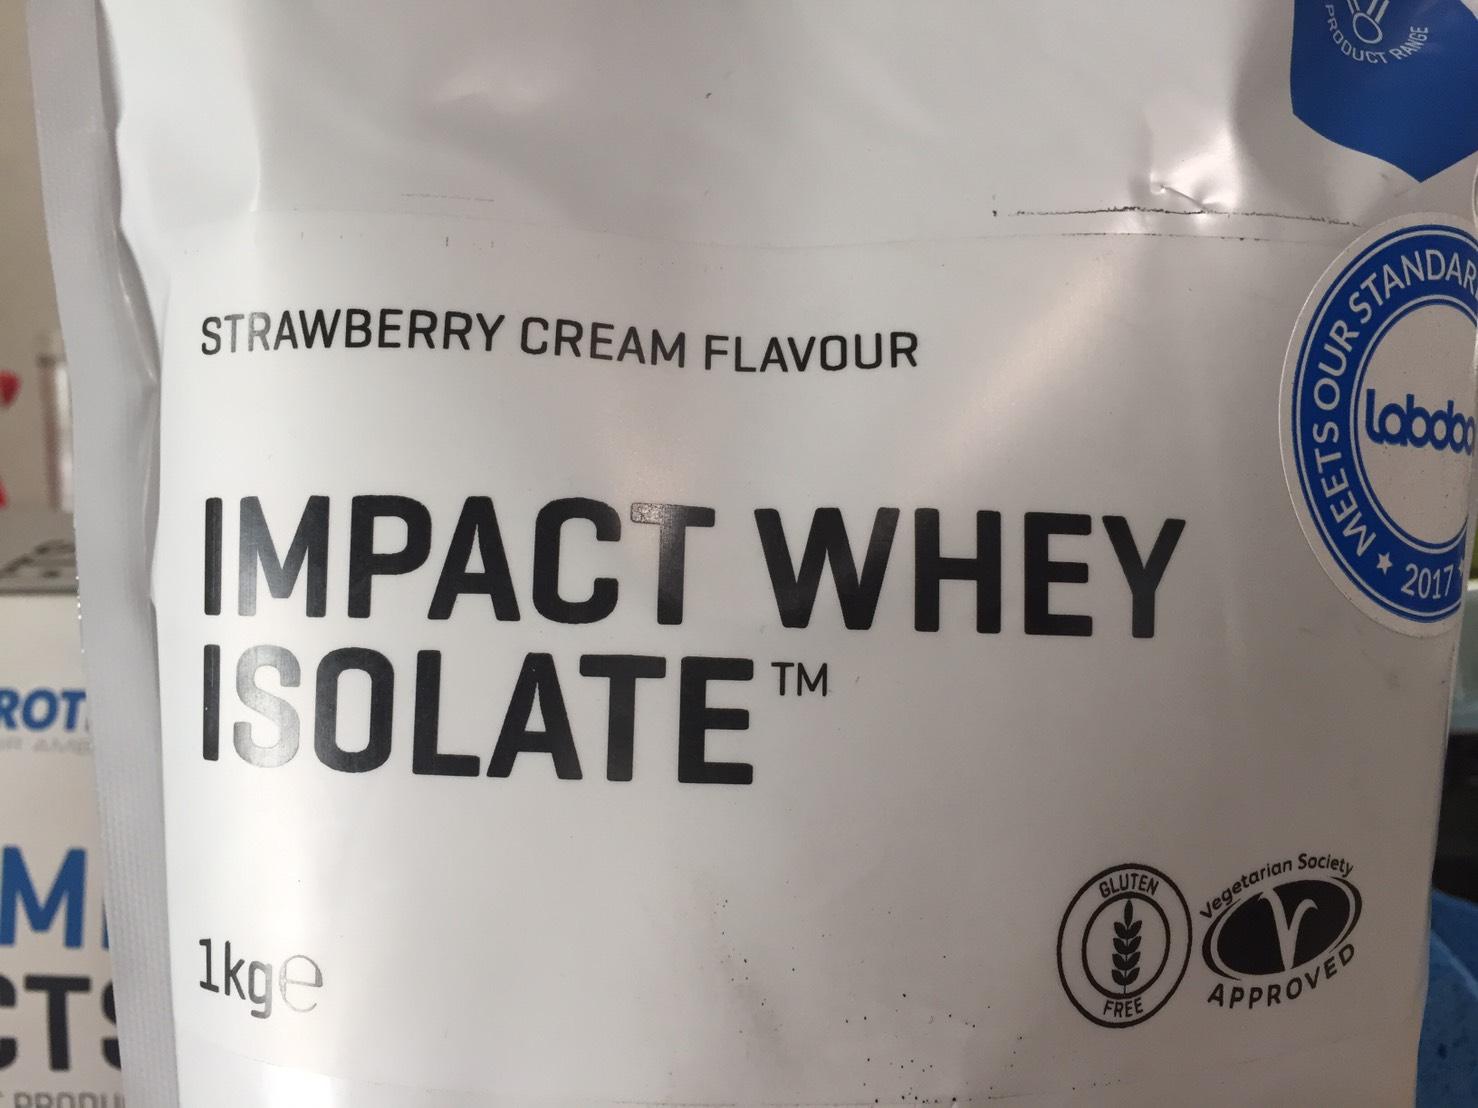 【WPI】IMPACT 分離ホエイプロテイン (アイソレート)「STRAWBERRY CREAM FLAVOUR(ストロベリークリーム味)」